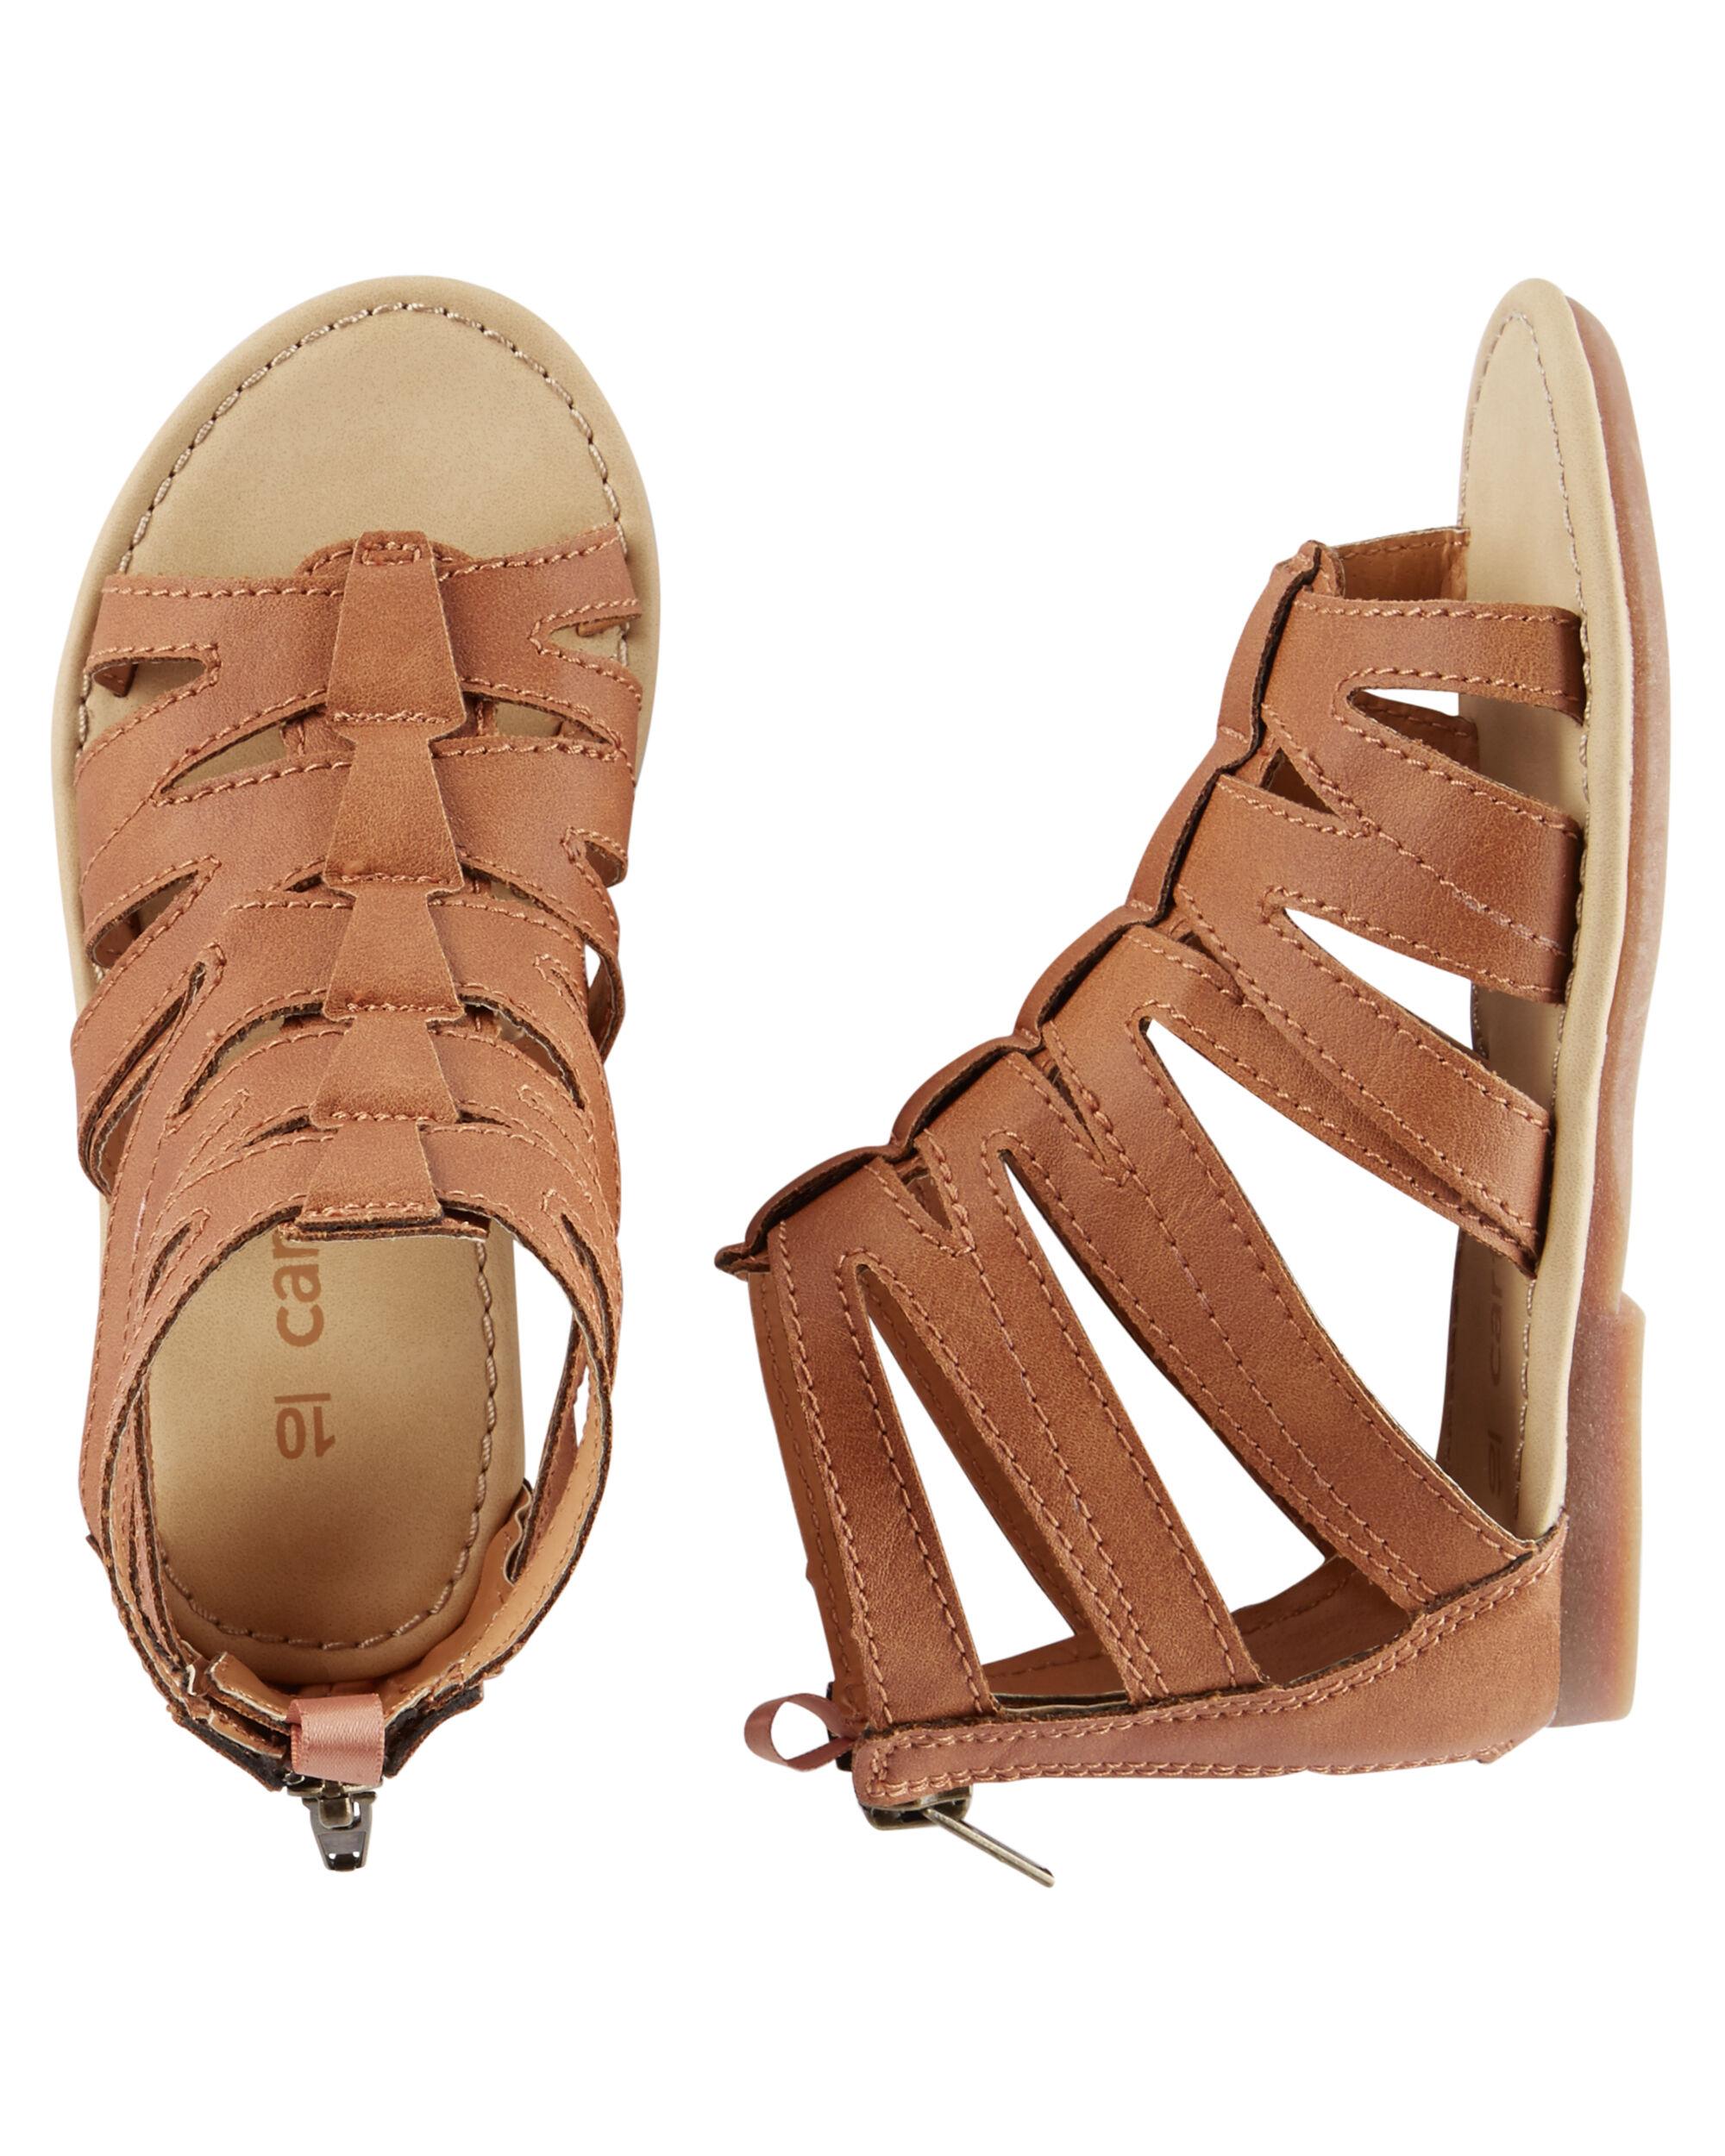 Carter's Gladiator Sandals | carters.com